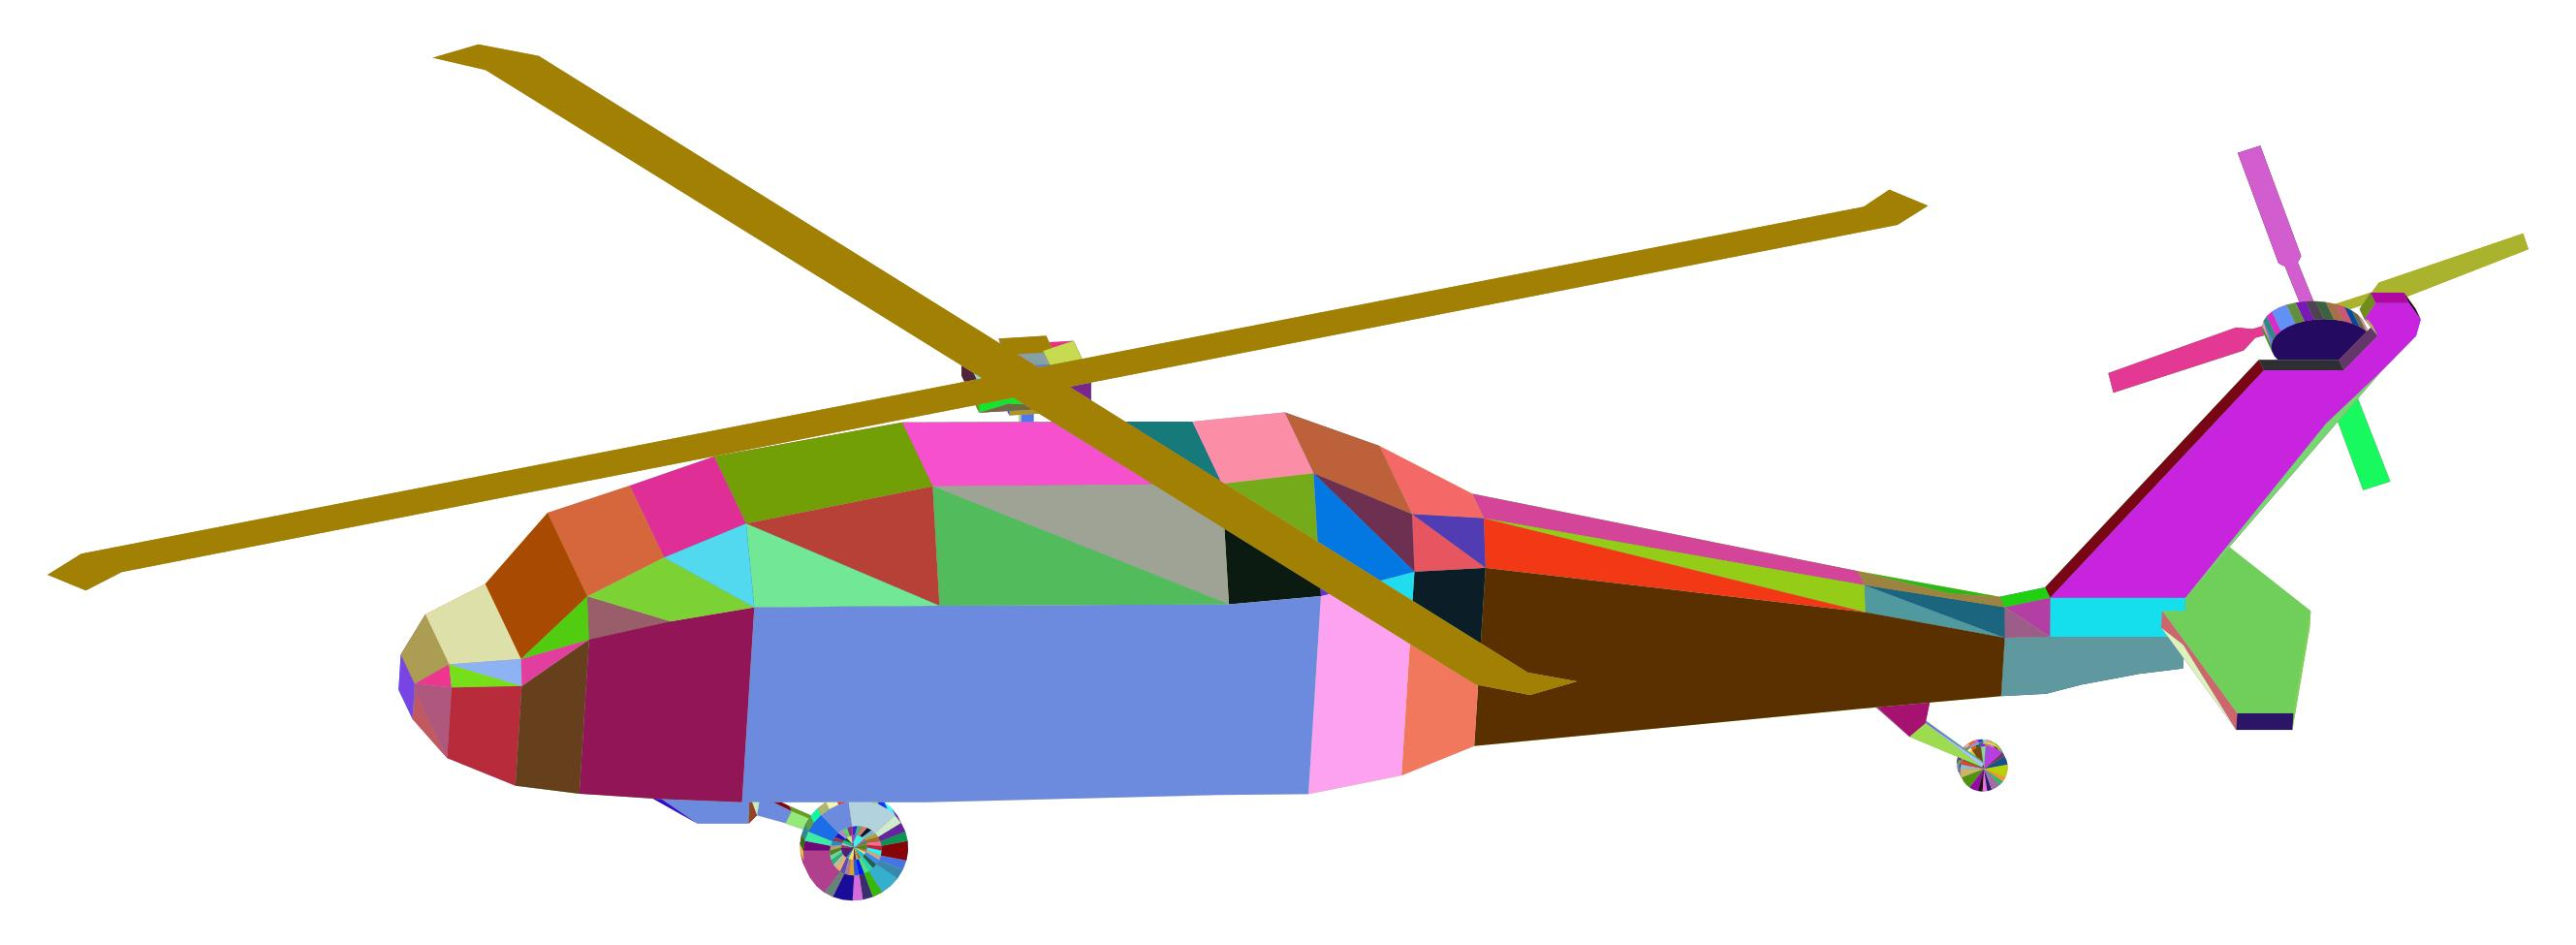 2658x975 3d Low Poly Blackhawk Helicopter Prismatic Clipart